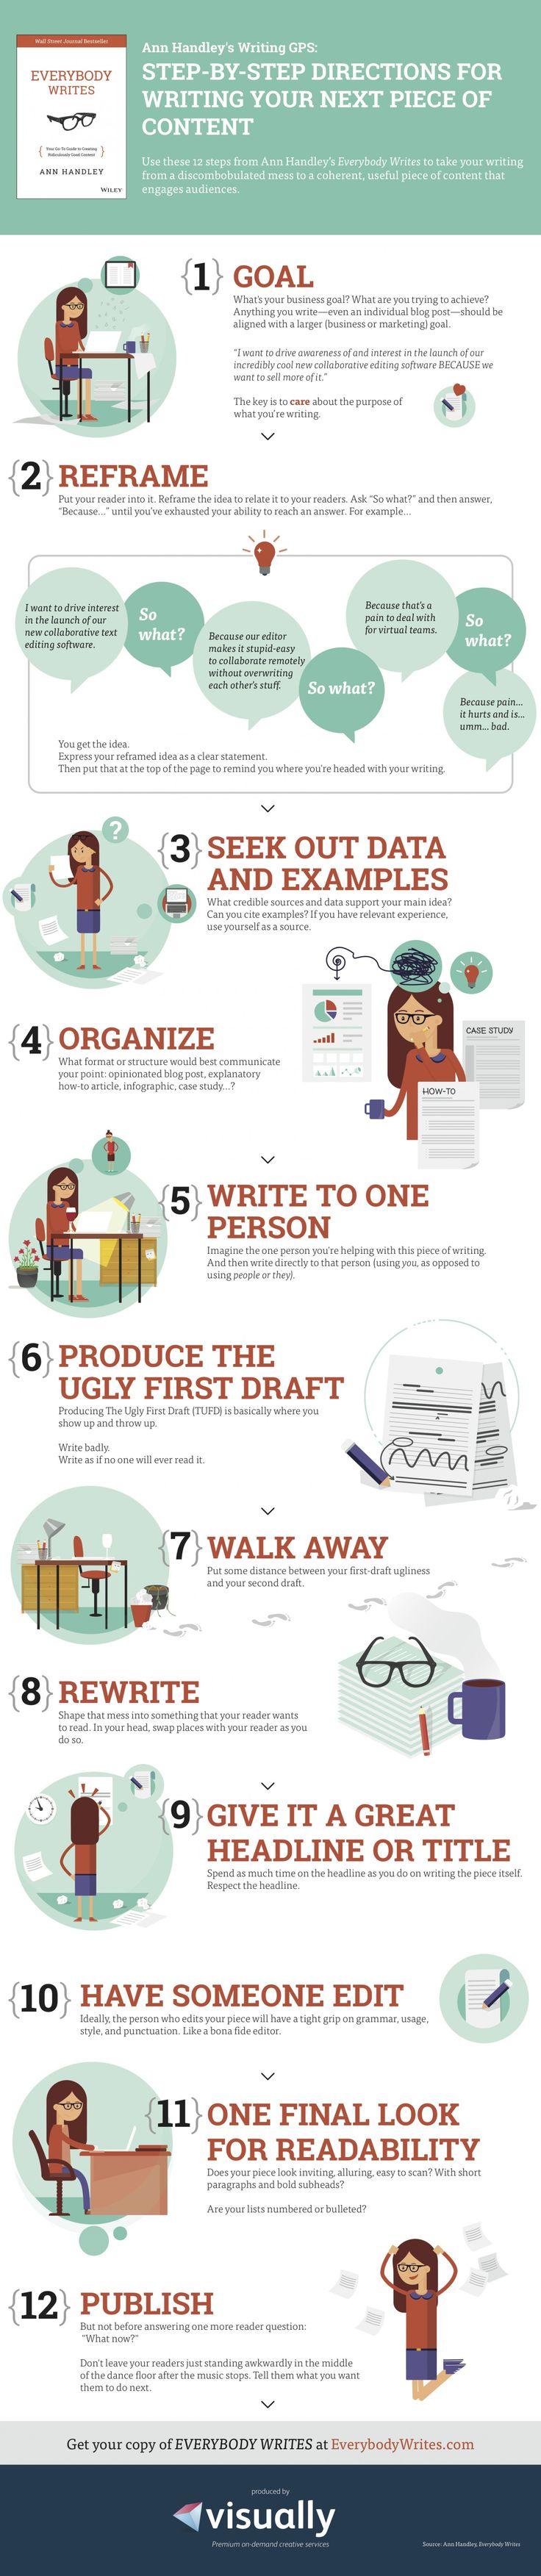 12 pasos para escribir tu próximo artículo del blog: http://www.inc.com/laura-montini/infographic/a-completely-non-intimidating-writing-guide.html